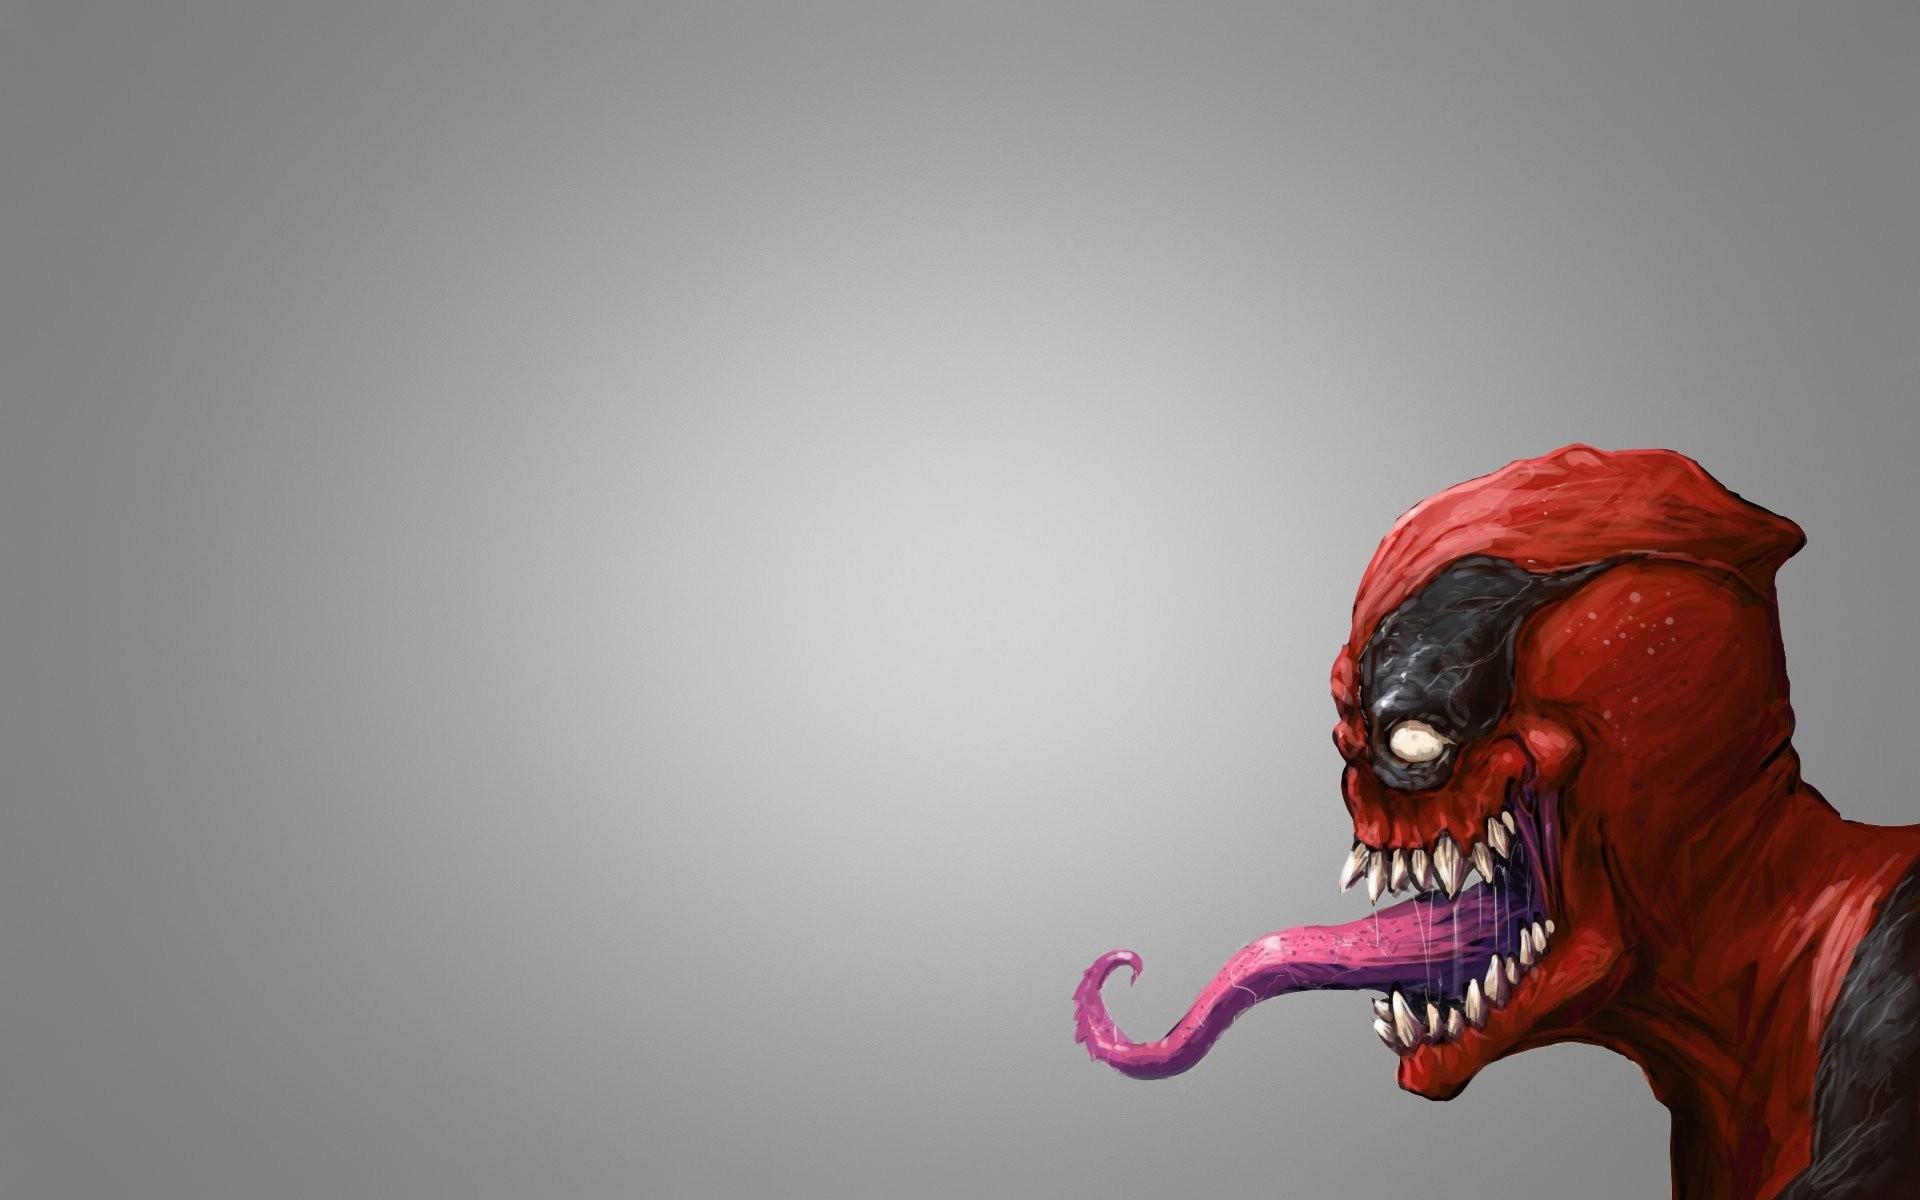 deadpool deadpool red mask english monster venom carnage carnage venom  comics spider-man spiderman